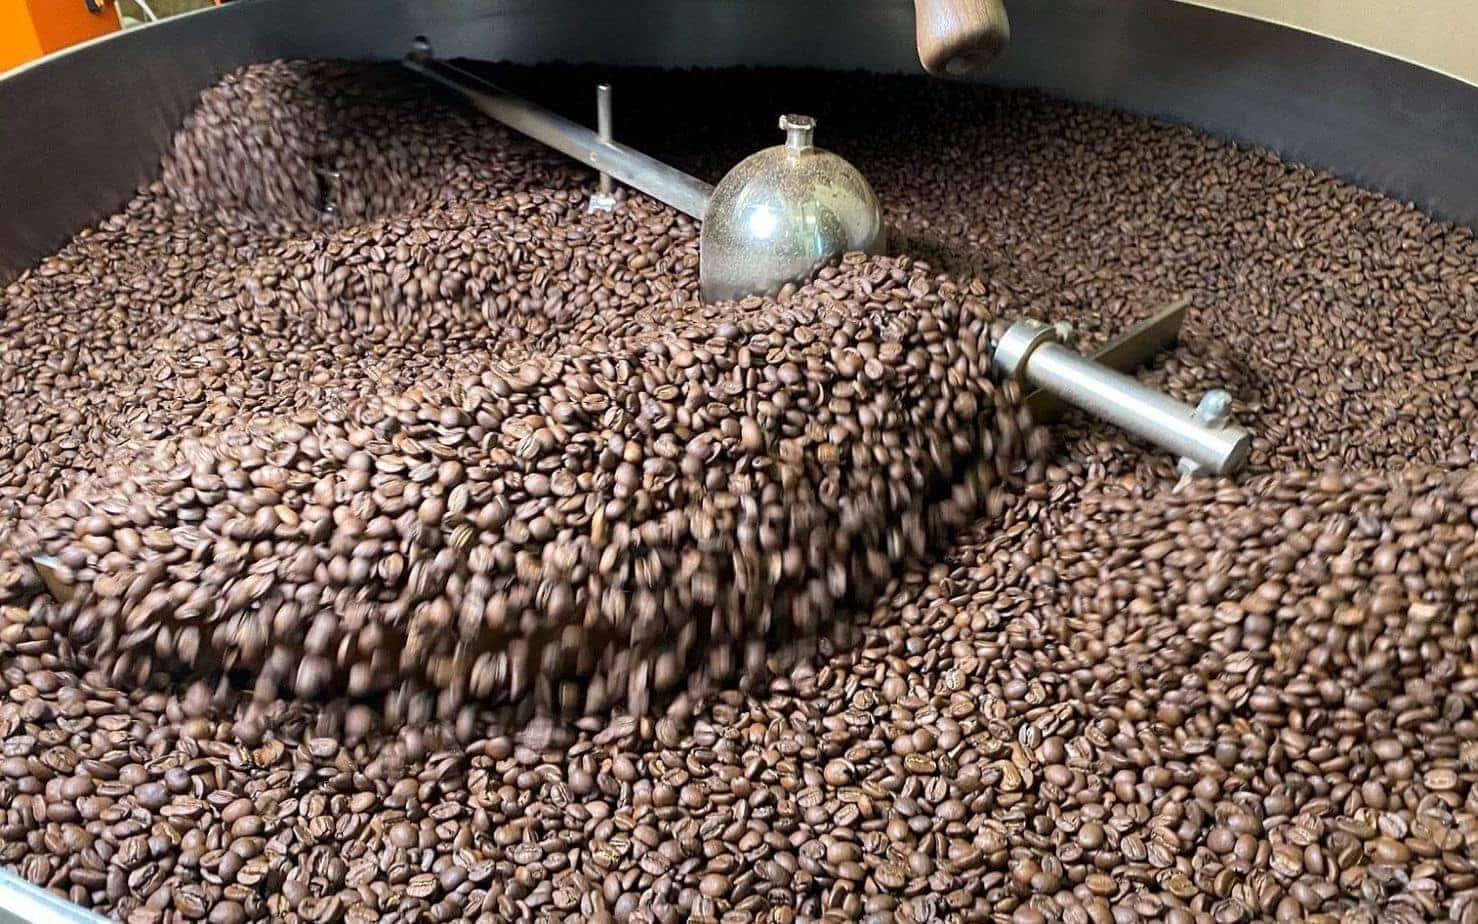 Backyard Coffee Coffeeness Kaffeebohnen beim roesten